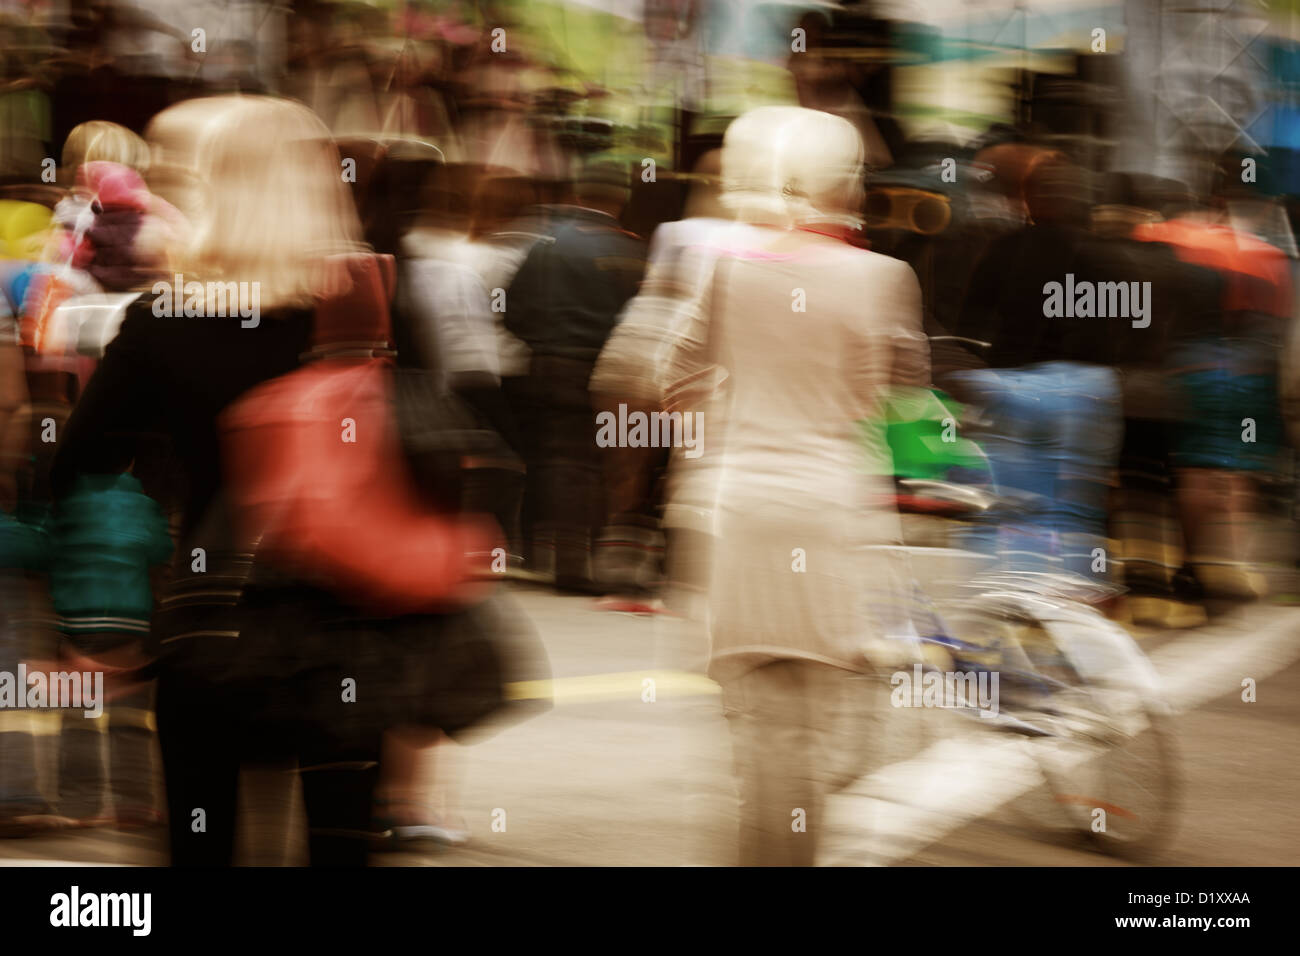 walking people in motion blur - Stock Image